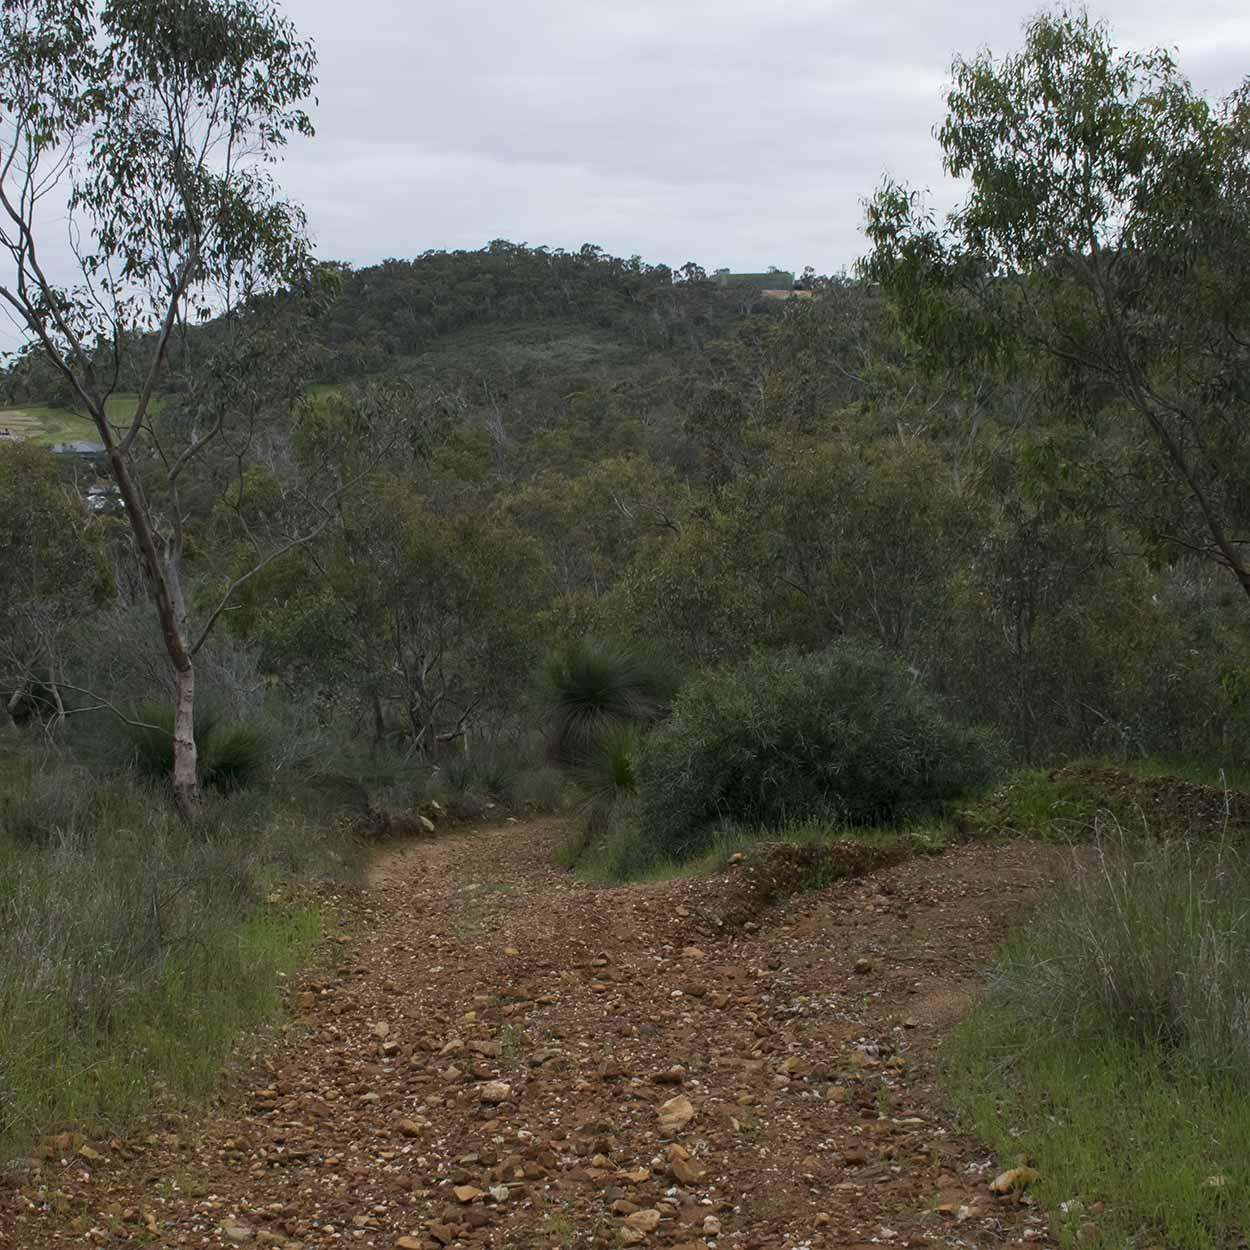 A rocky uphill path on the West Terrace Walk, Mundy Regional Park, Perth, Western Australia